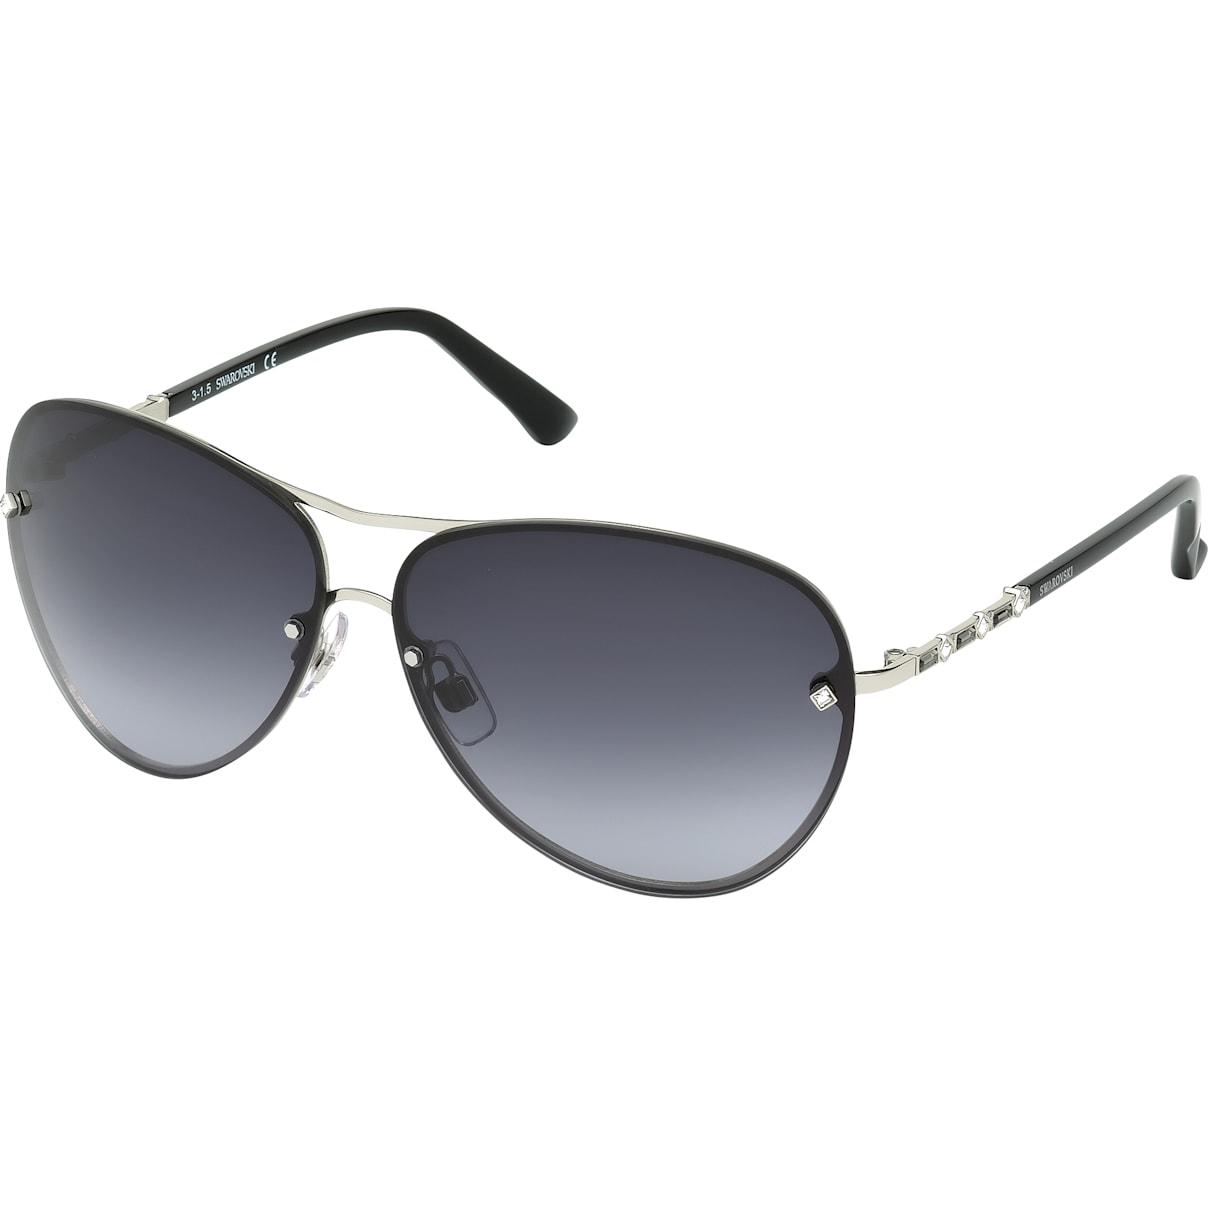 Swarovski Fascinatione Sunglasses, SK0118 17B, Black